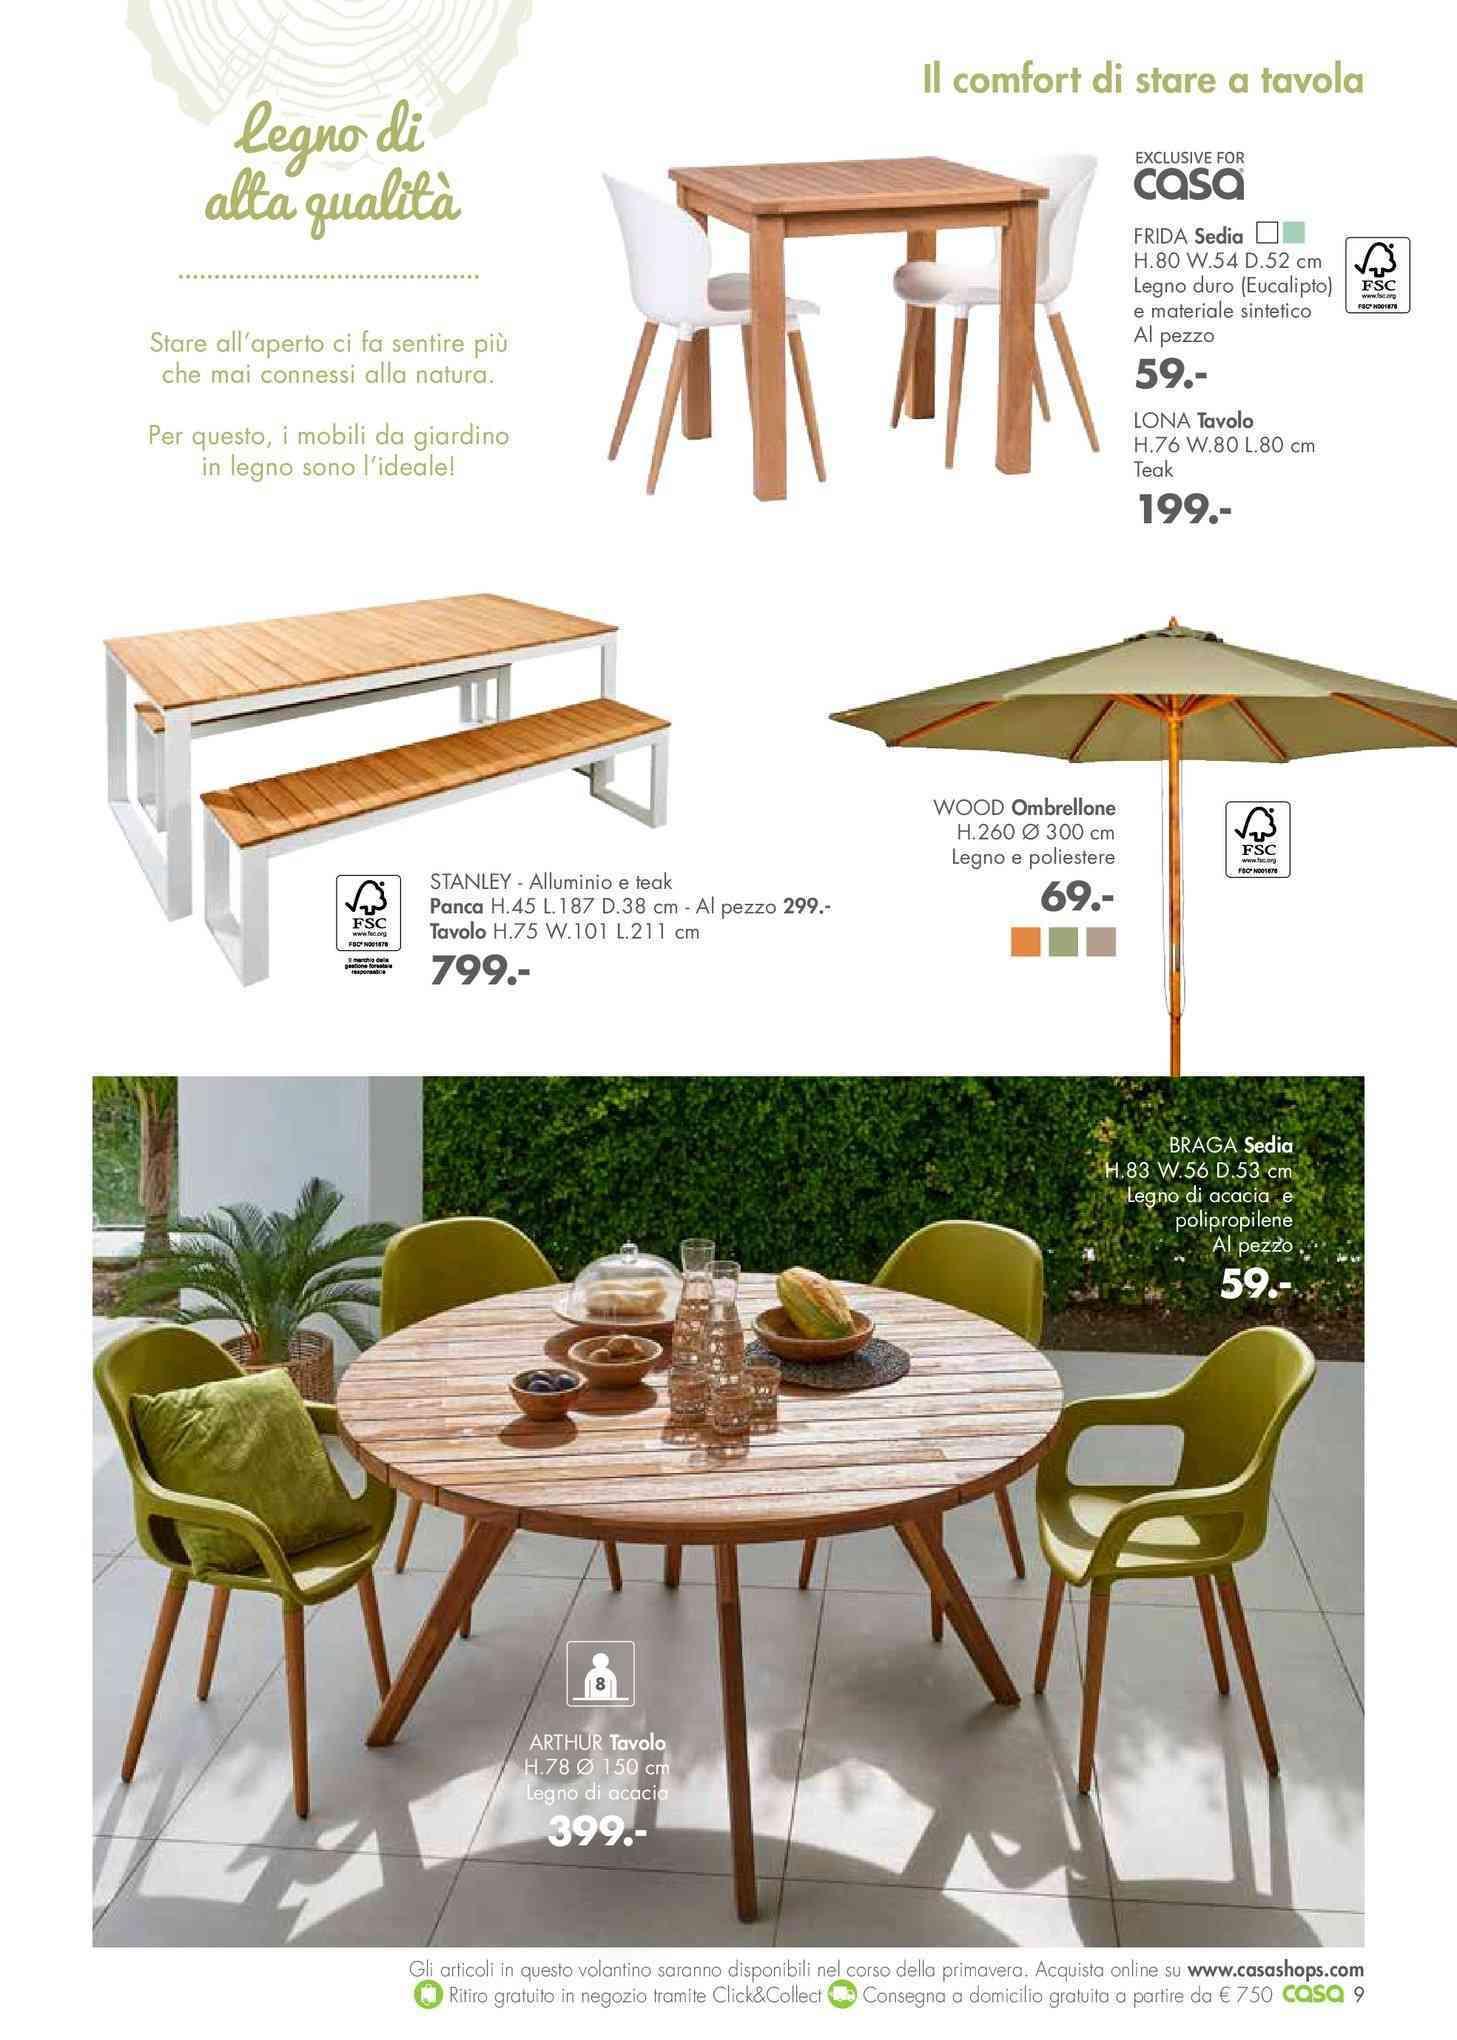 Offerte mobili da giardino Cavalese, arredo giardino, gazebo